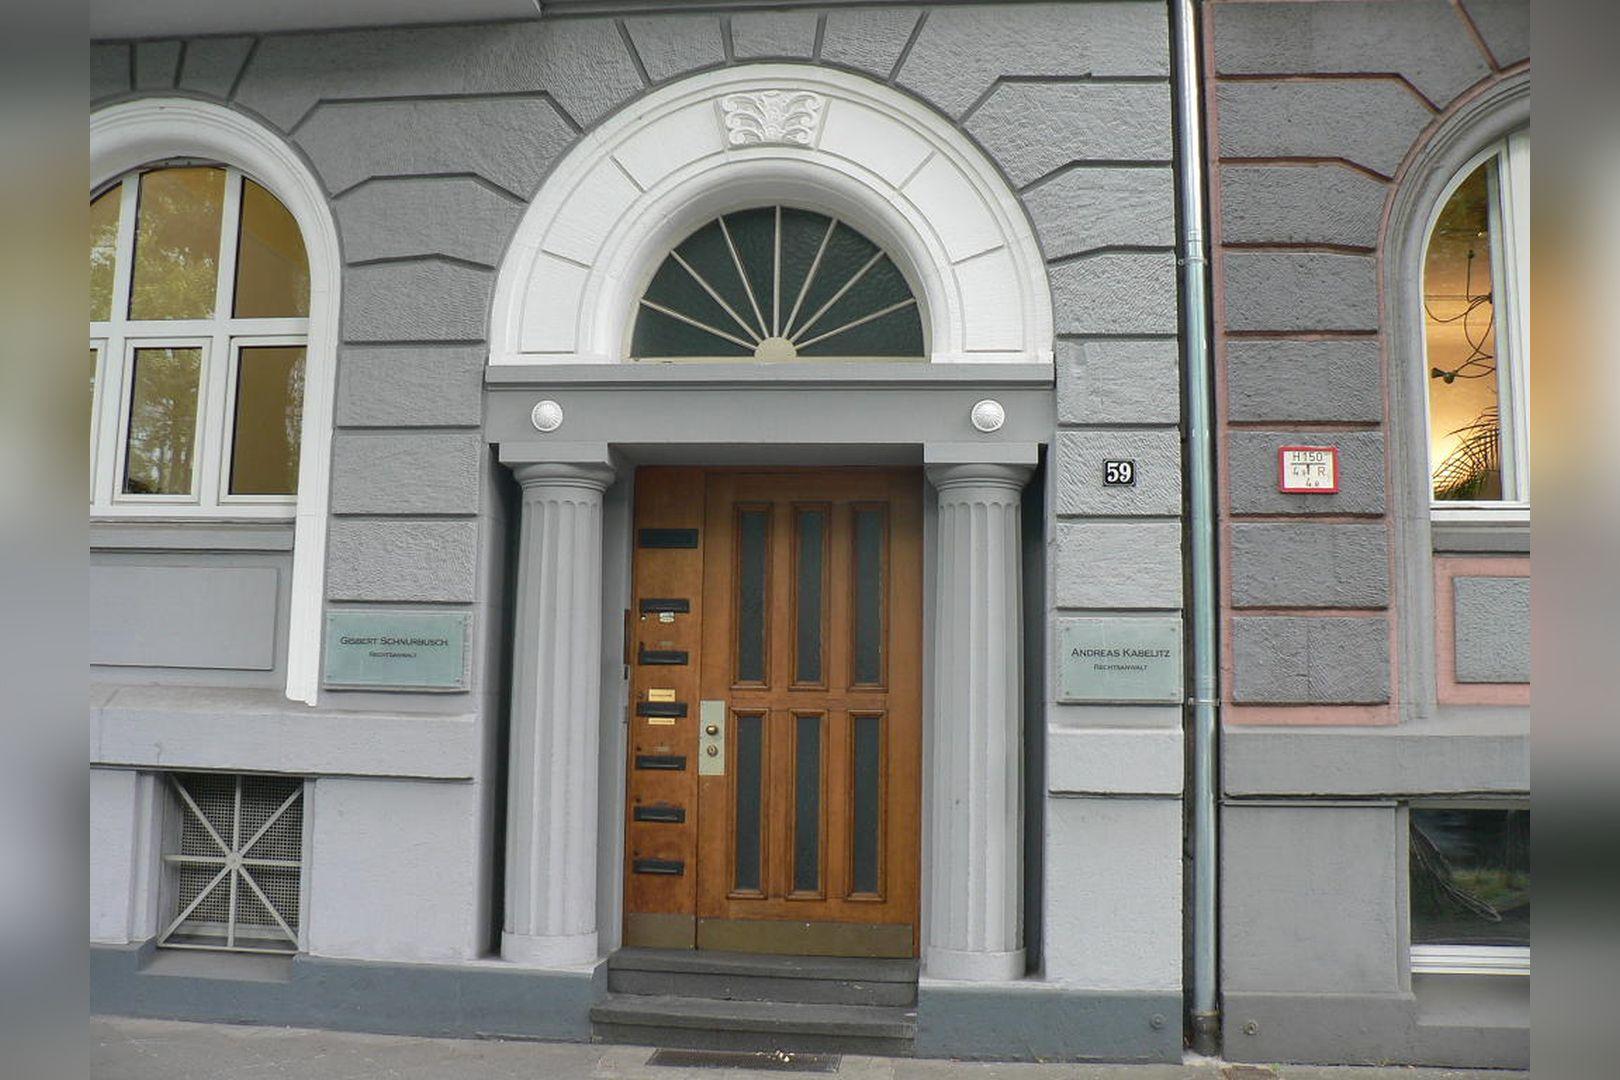 Immobilie Nr.114 - Bürofläche im Altbauobjekt - Bild 3.jpg